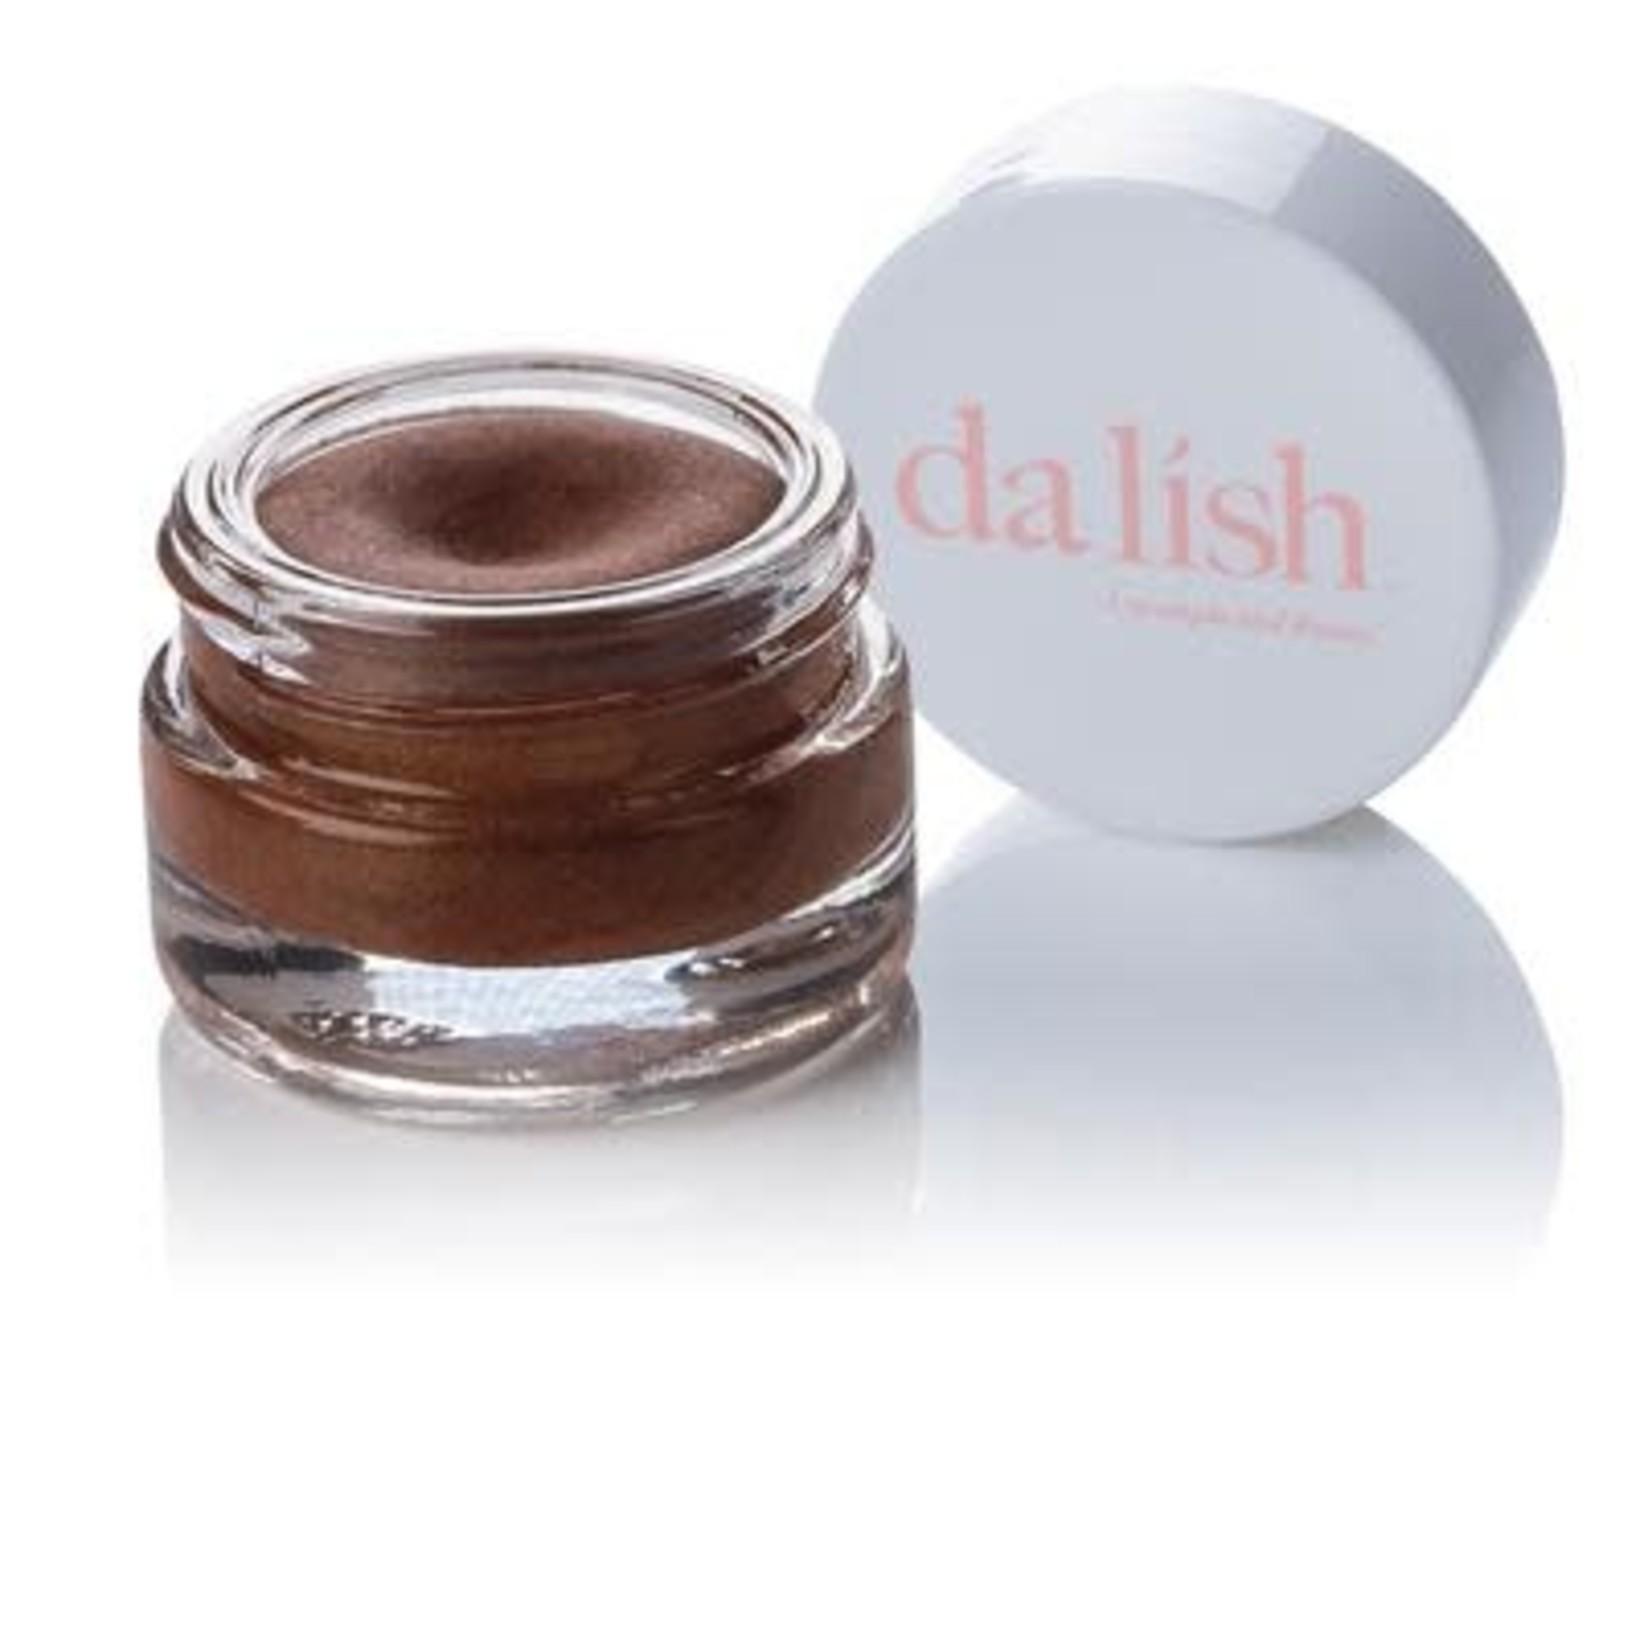 Dalish Lip and Cheek Balm